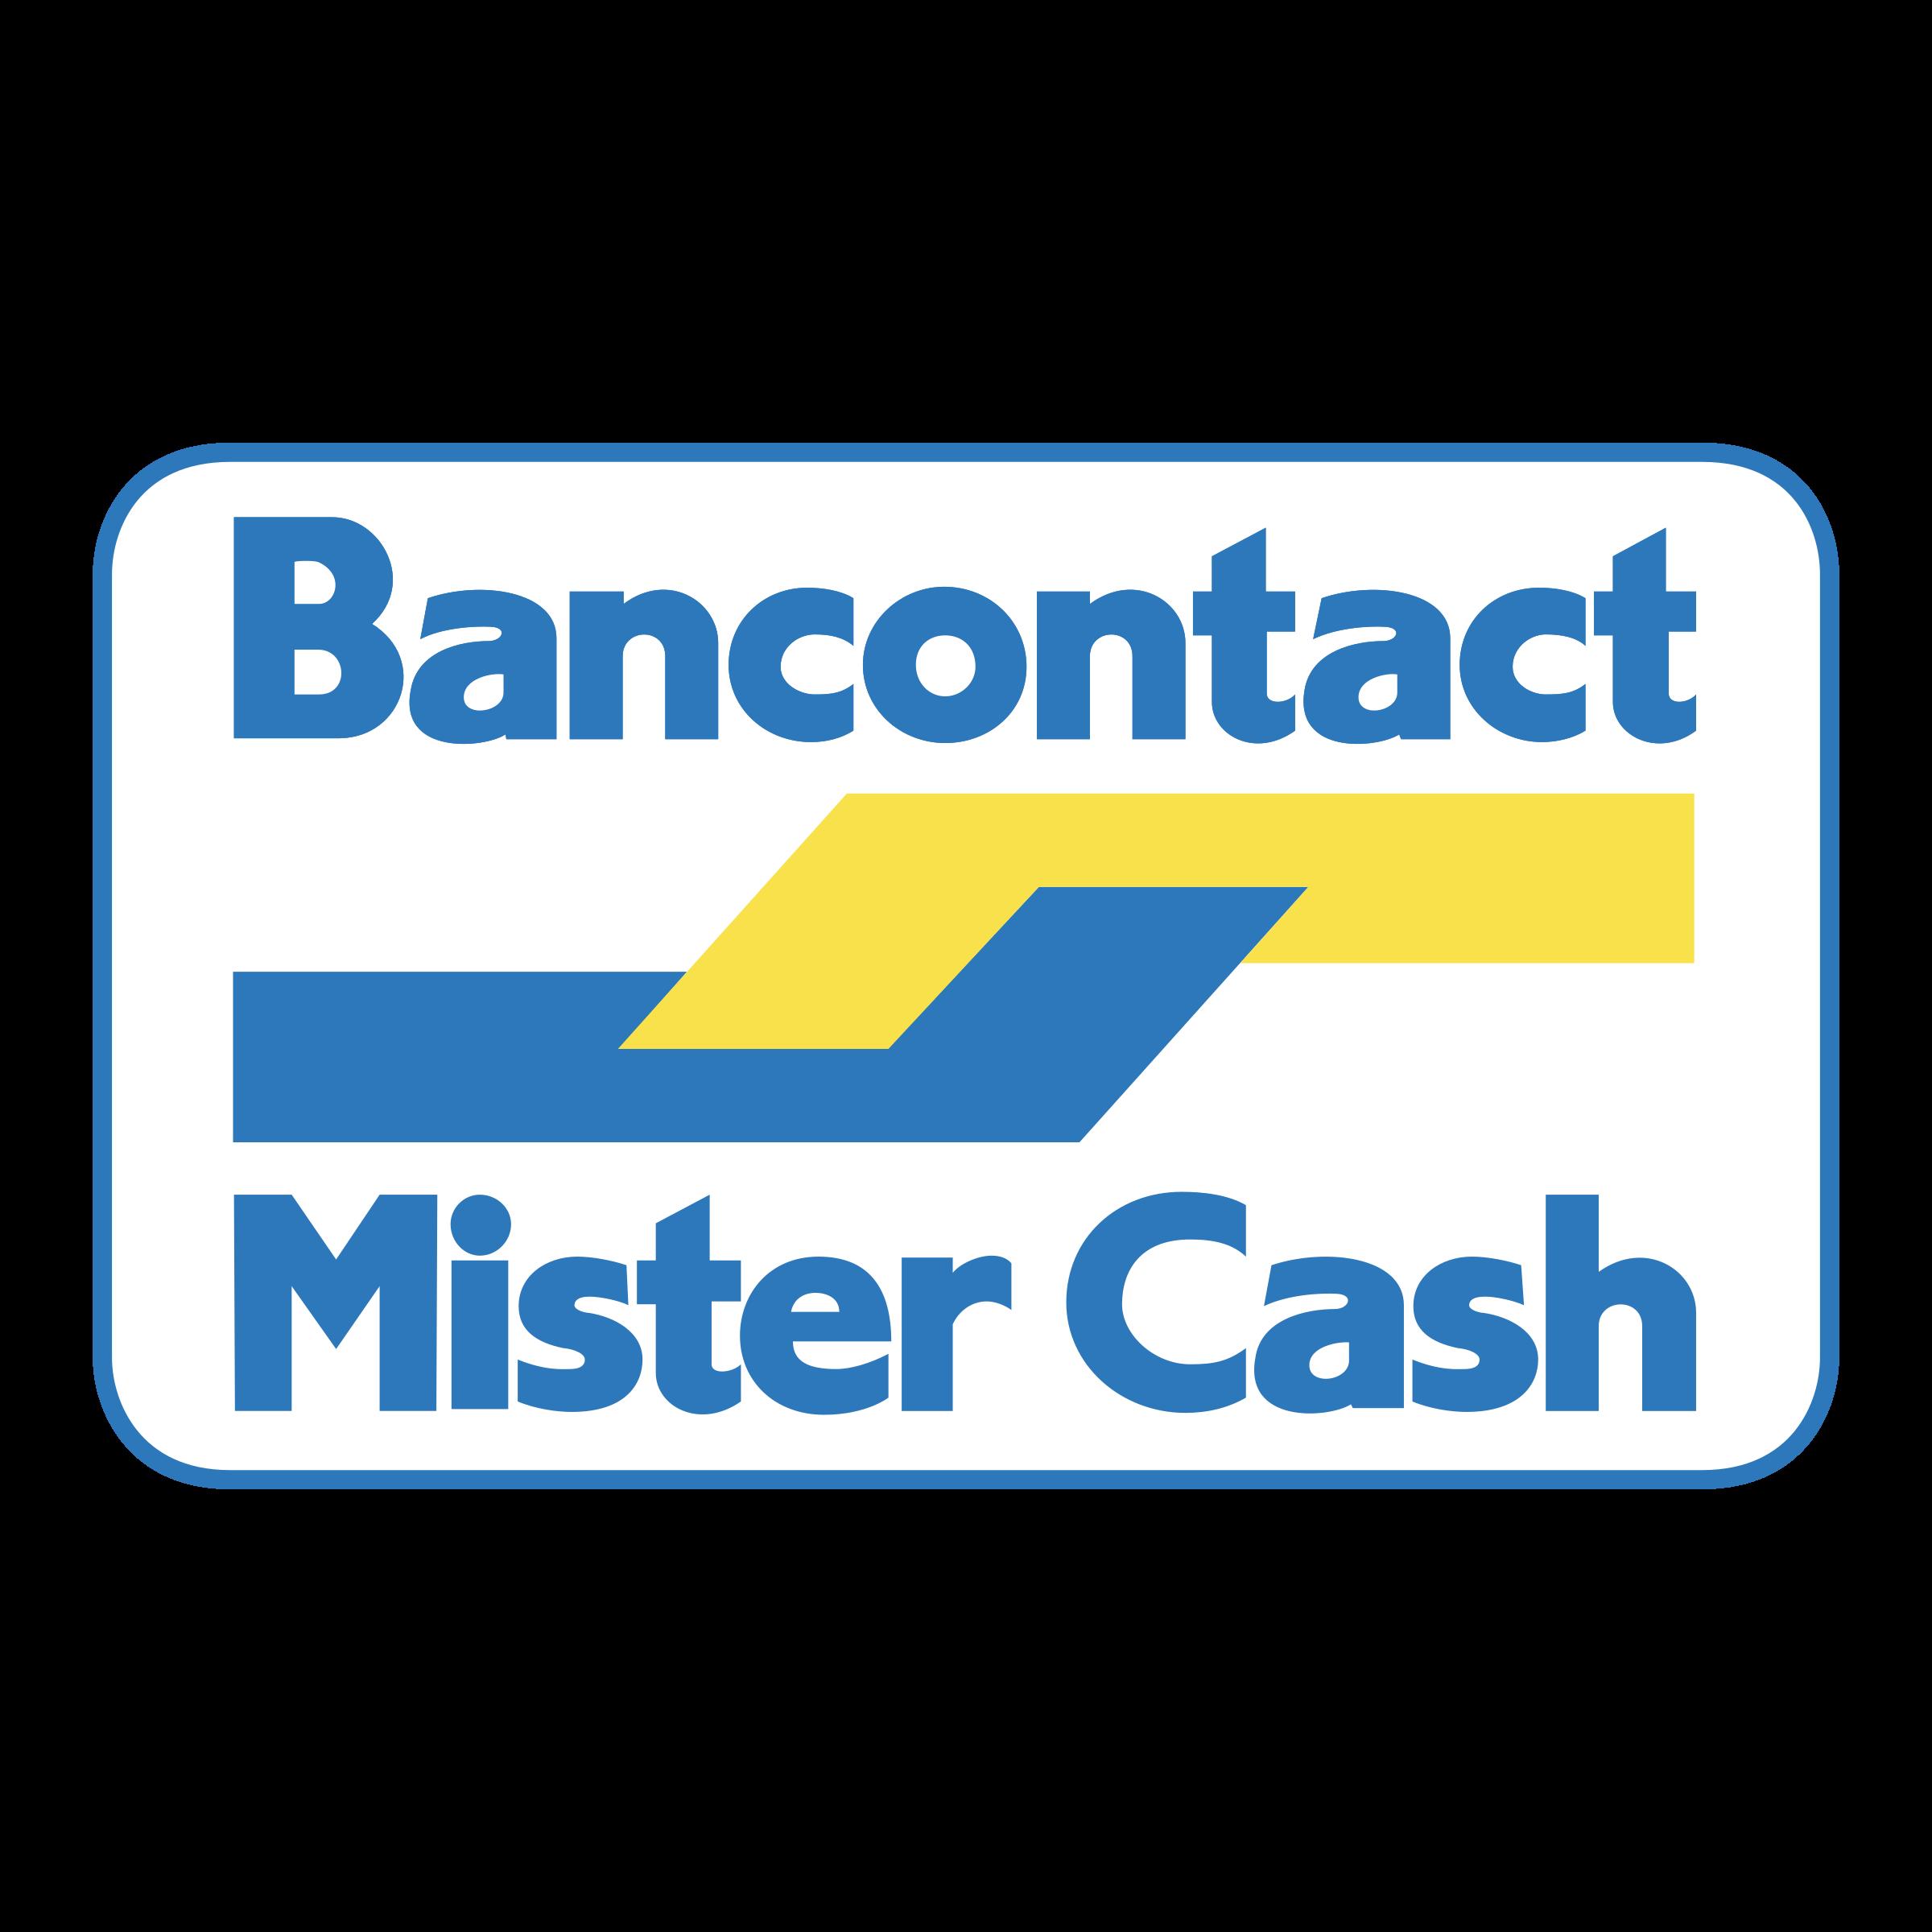 Bancontact Logo - Purpuz Planner